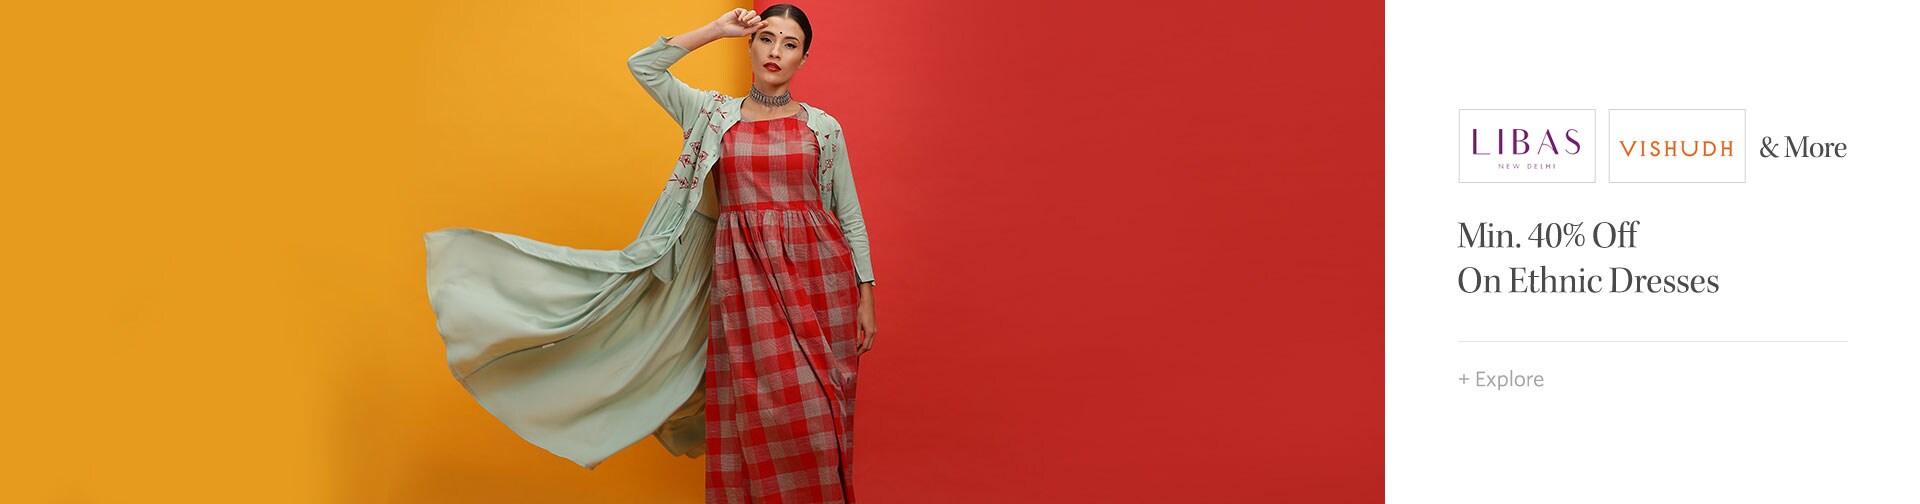 Min 40% Off on Ethnic Dresses